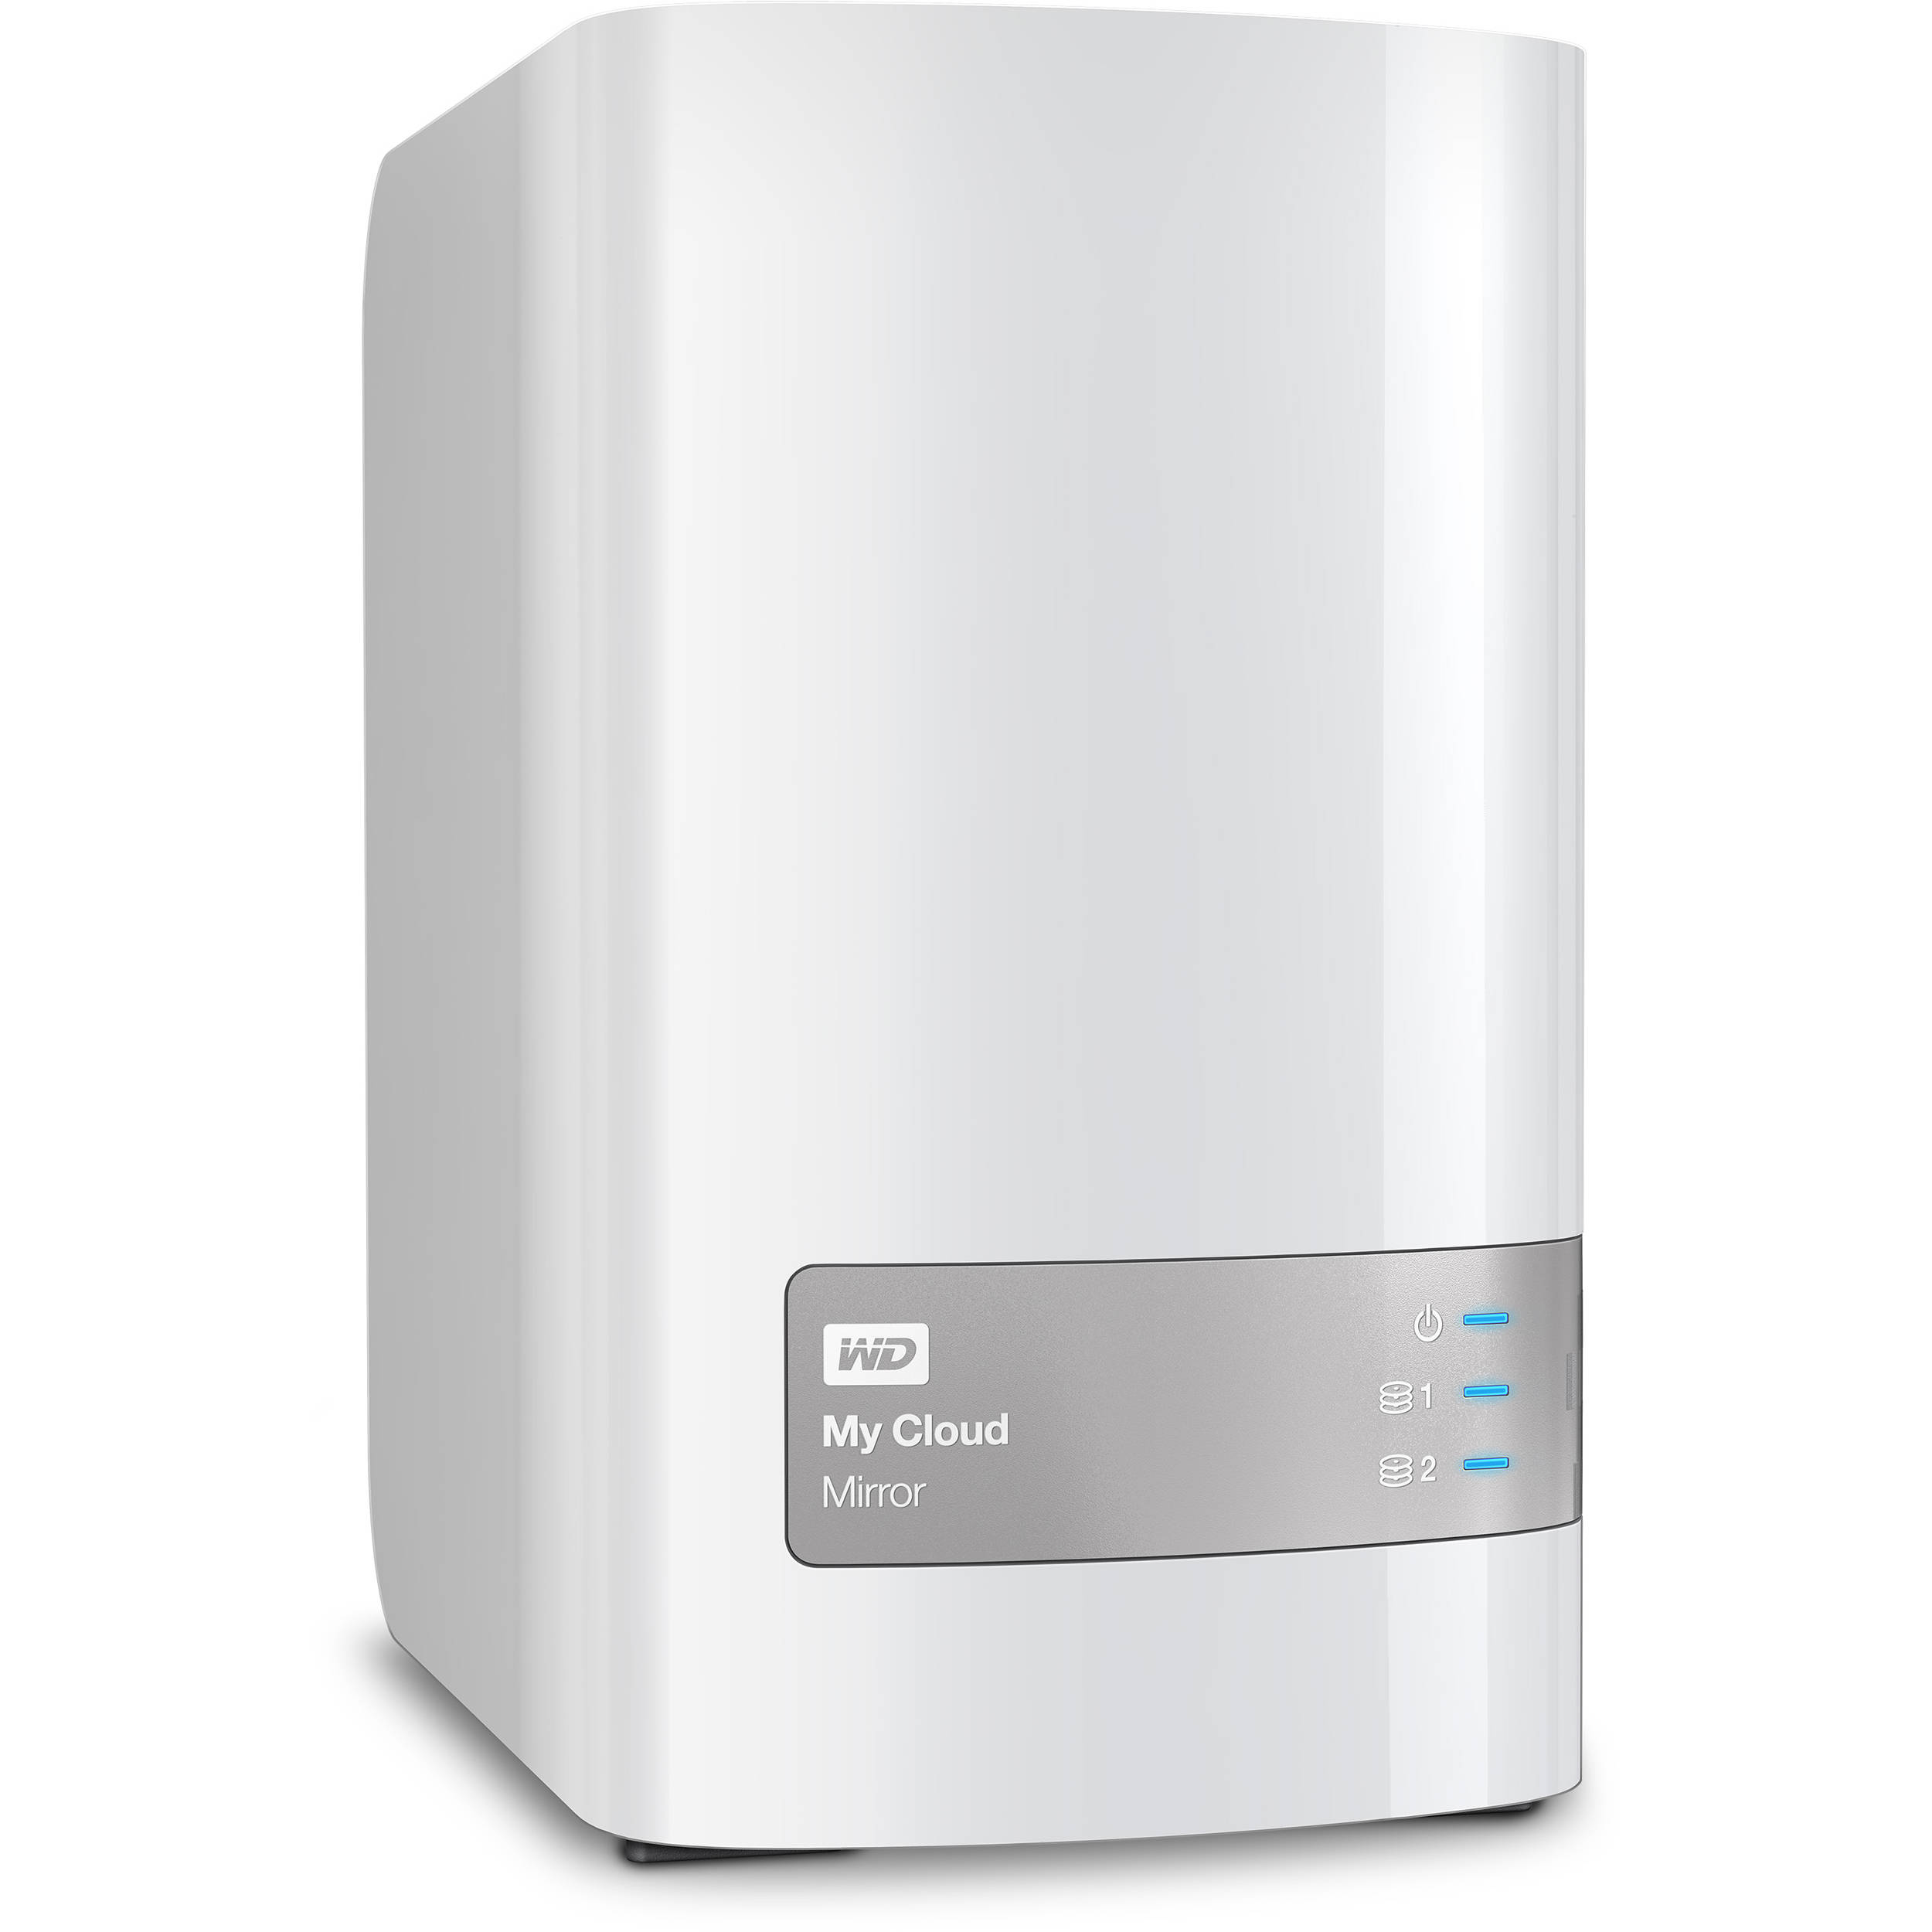 WD My Cloud Mirror (Gen 2) 4TB 2-Bay NAS WDBWVZ0040JWT-NESN B H 5fe0c70b5d34